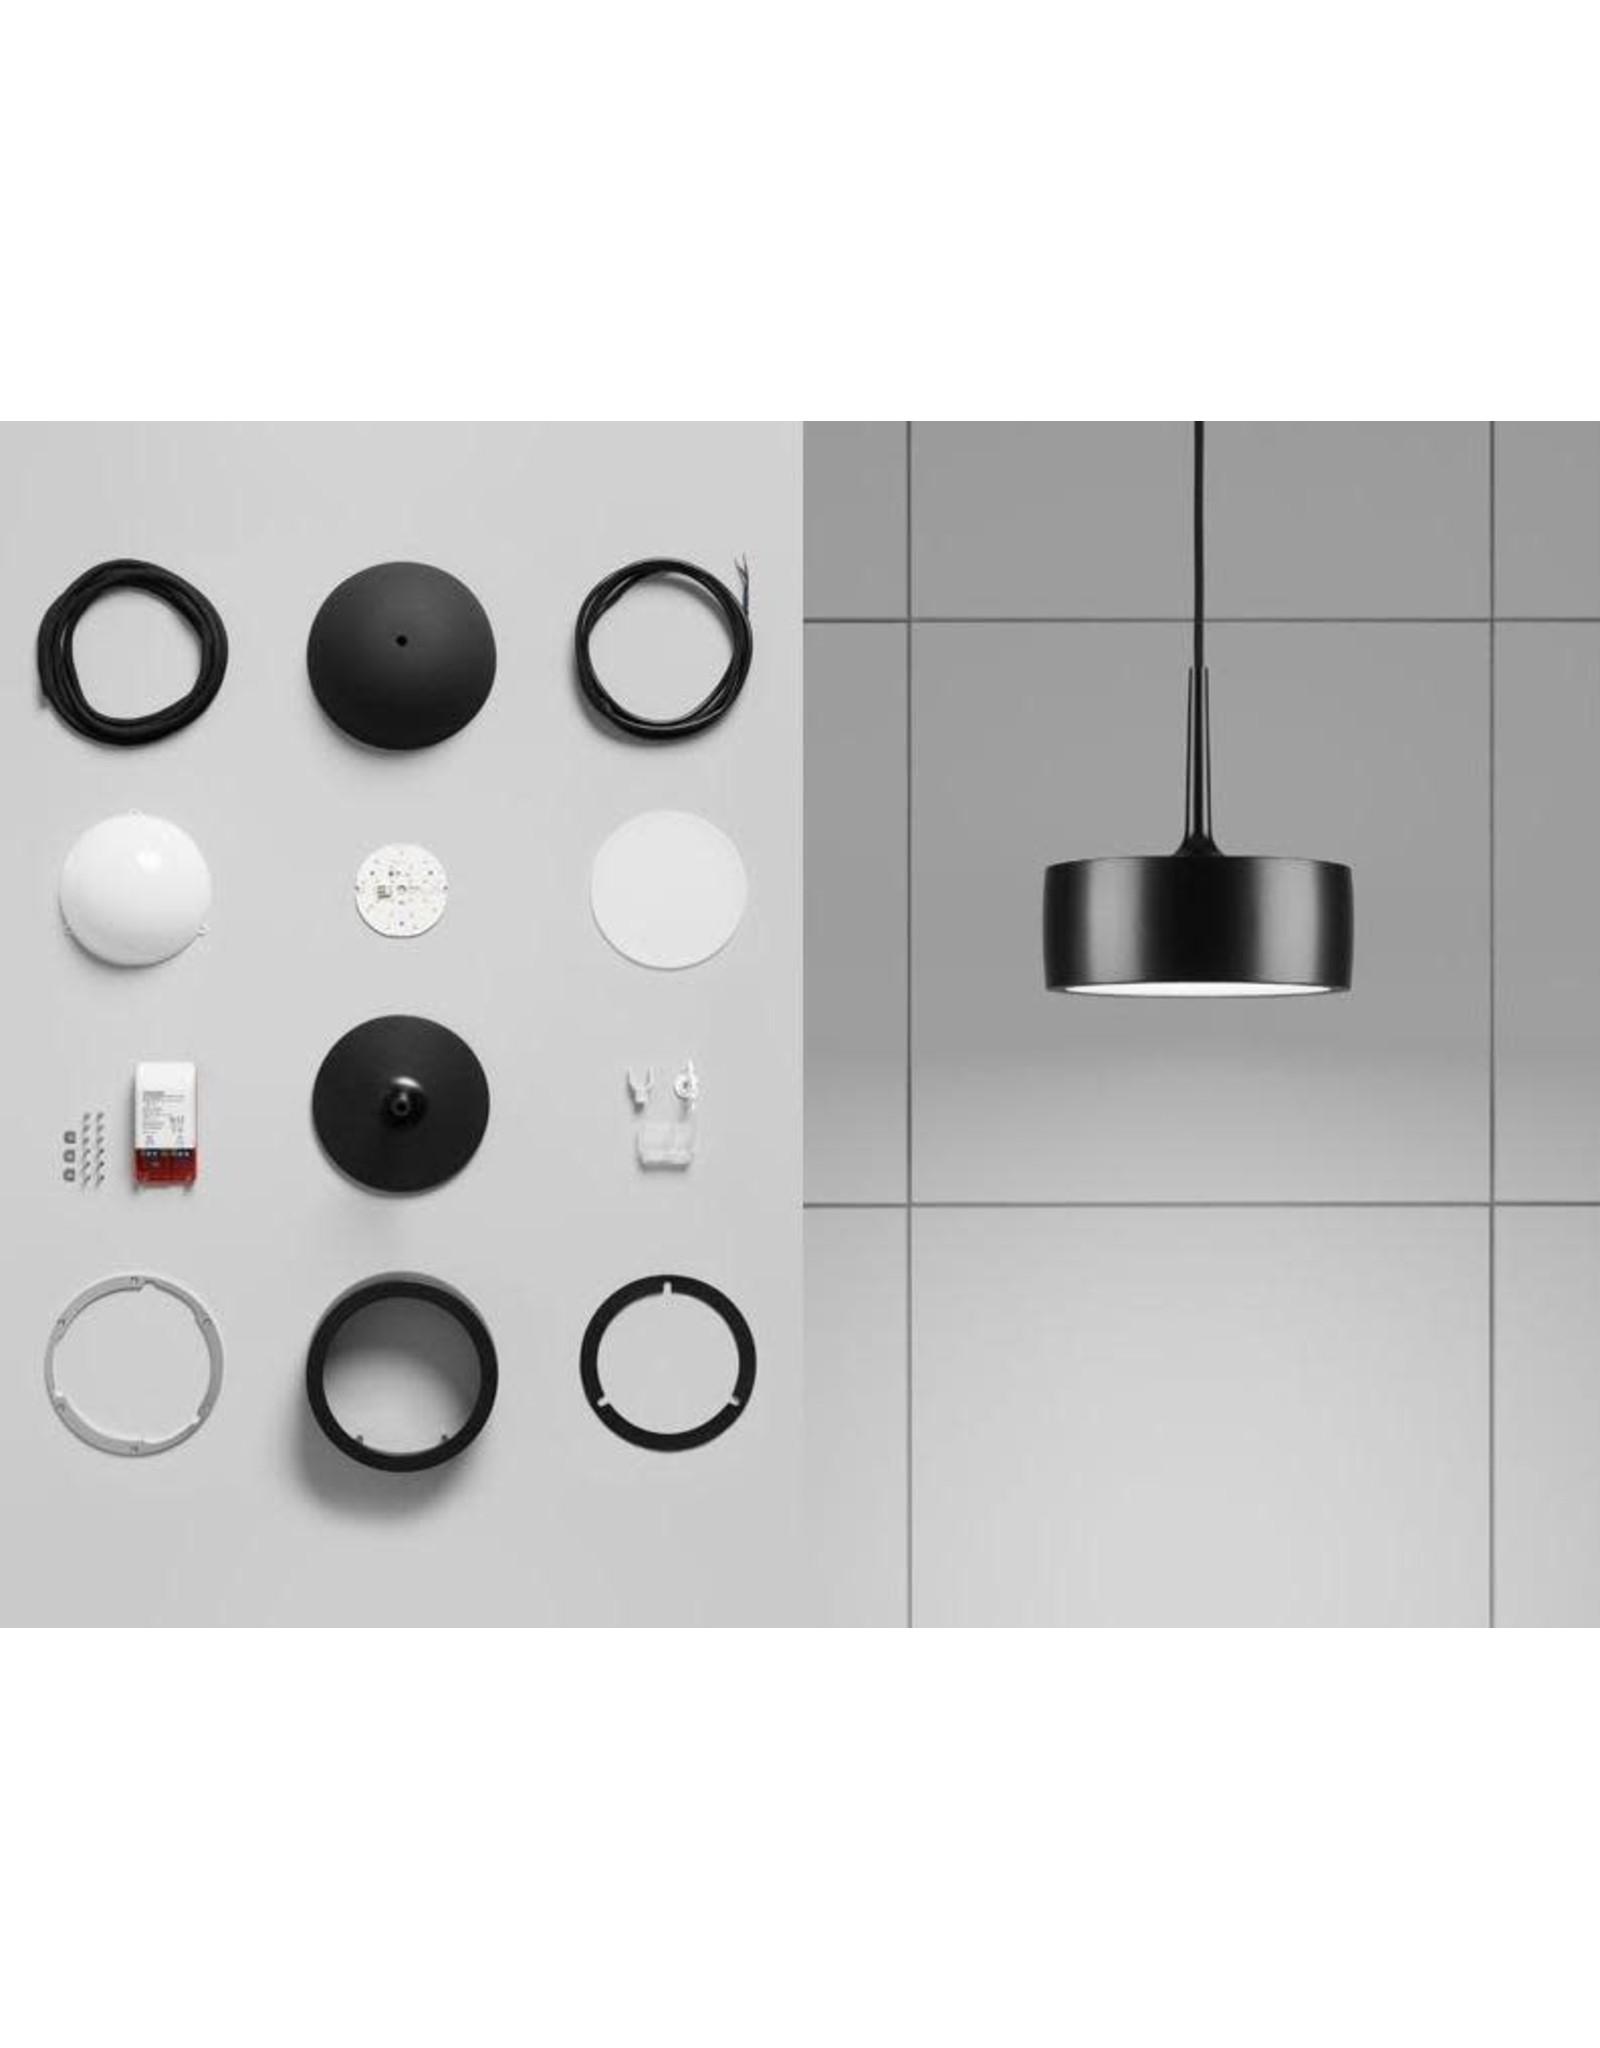 RIFF 150 冰球形狀黑色吊燈